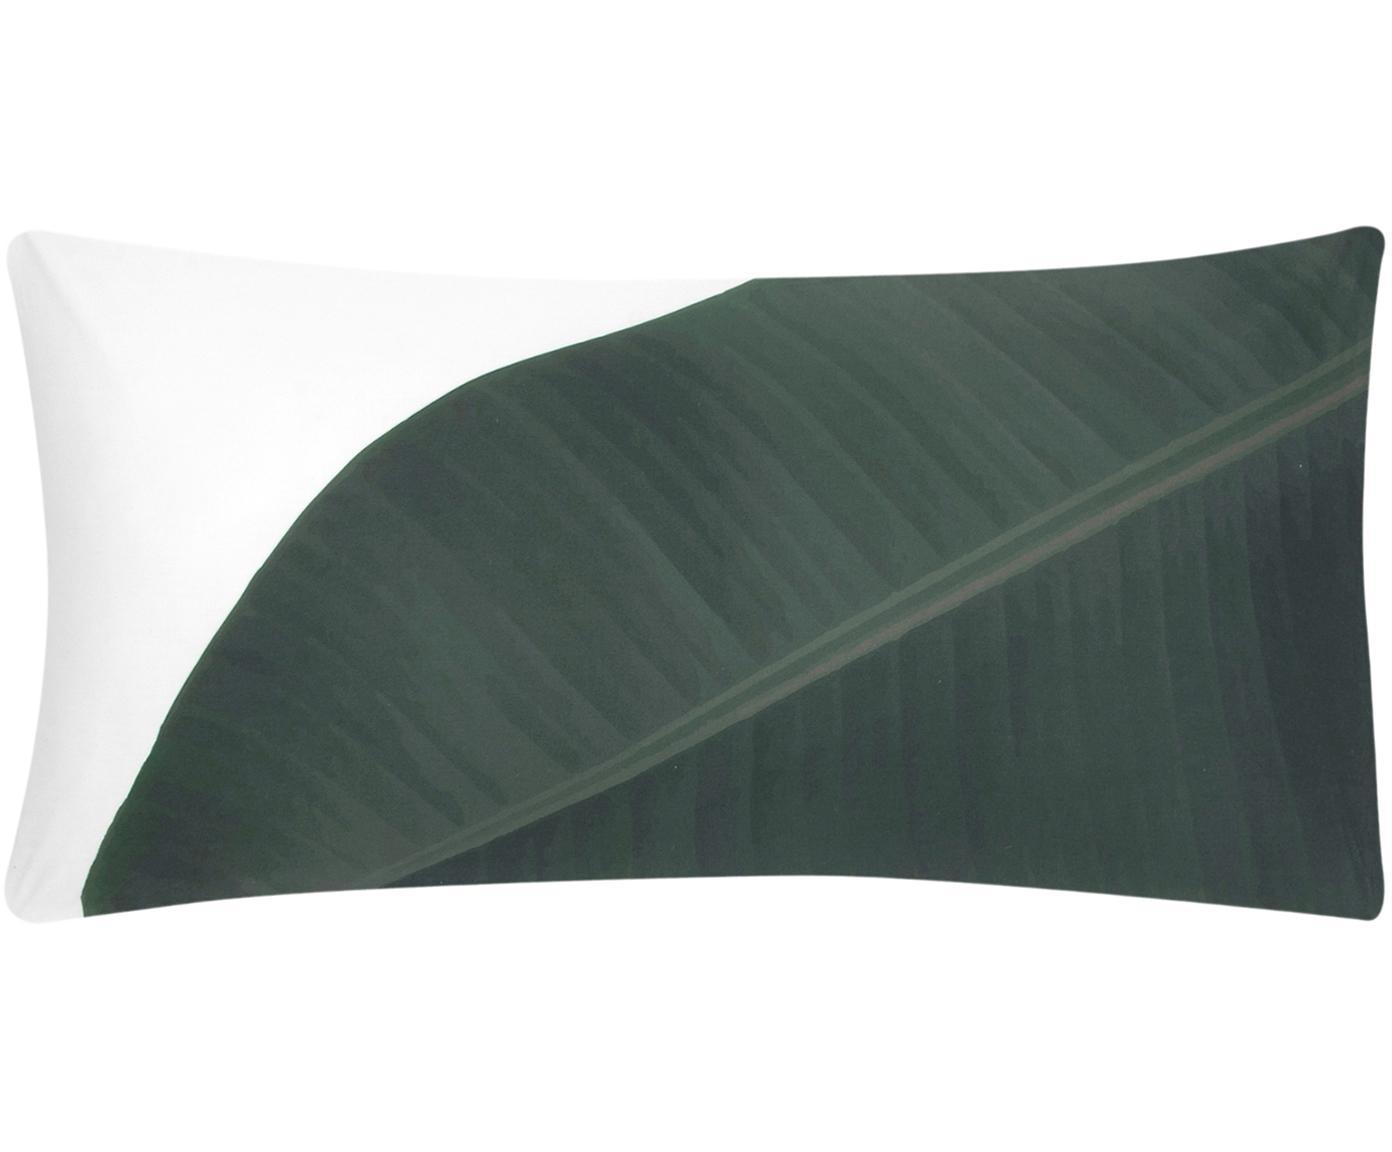 Baumwollperkal-Kissenbezüge Banana mit Blattmotiv, 2 Stück, Webart: Perkal Fadendichte 180 TC, Vorderseite: Grüntöne Rückseite: Weiß, Uni, 40 x 80 cm